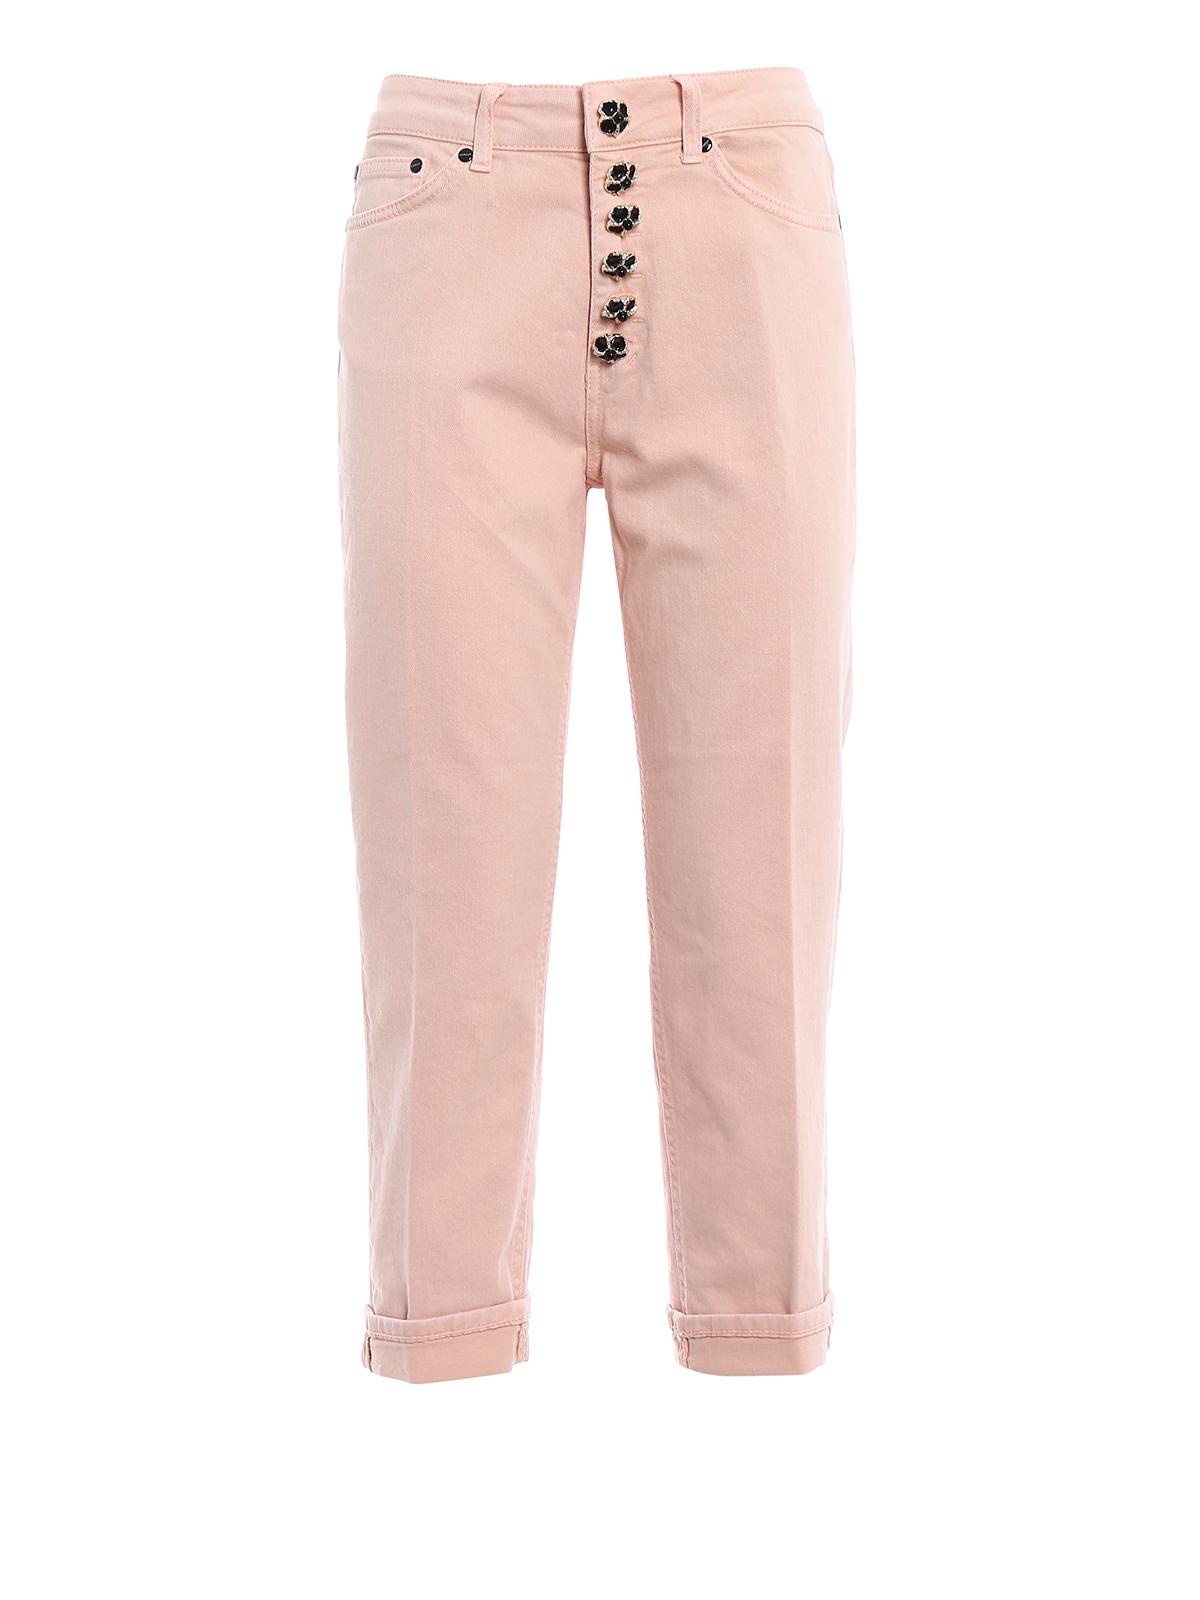 f6786c2904 Dondup - Jeans Koons rosa bottoni gioiello - jeans dritti, a ...